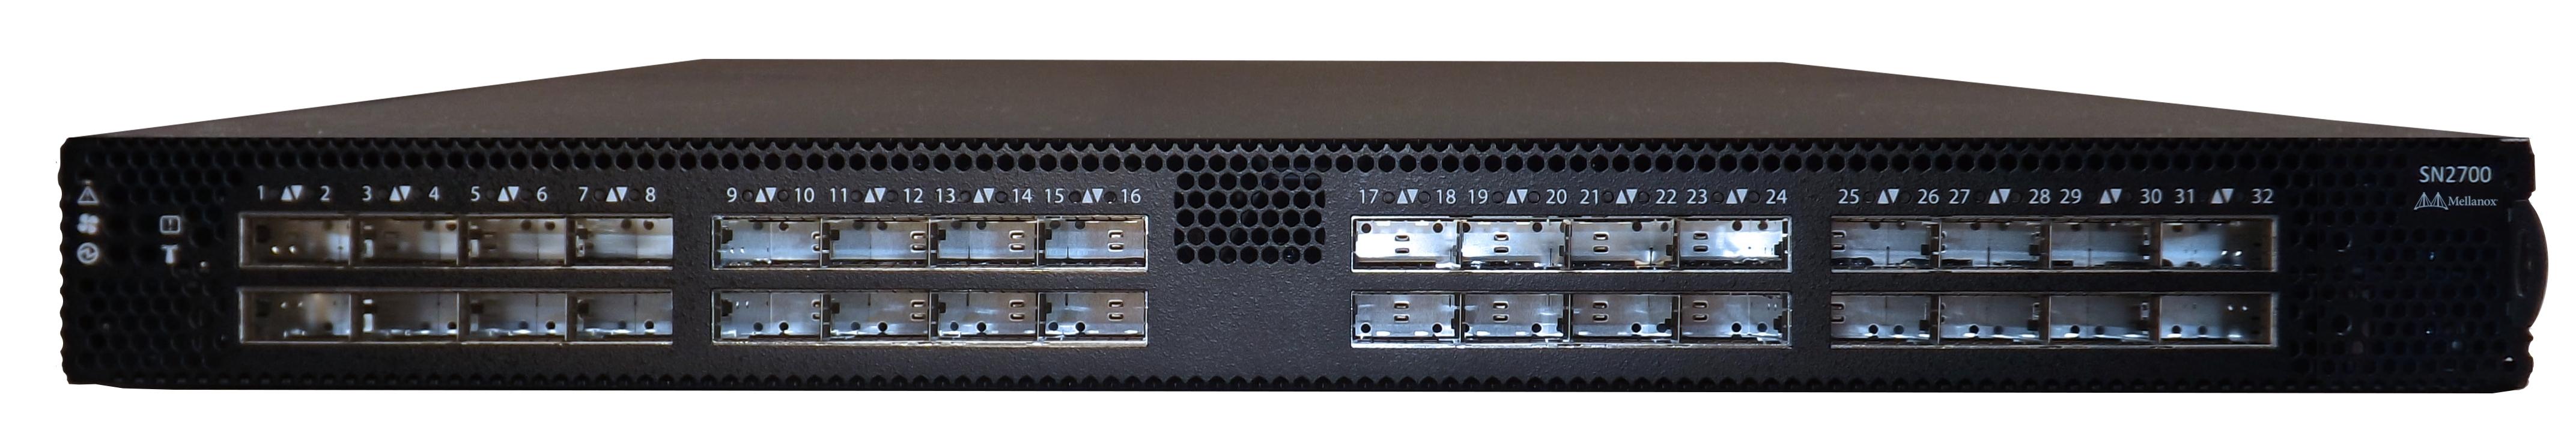 Mellanox Spectrum SN2700 32-Port 10/25/40/50/100 Gigabit Ethernet Switch (Photo: Business Wire)